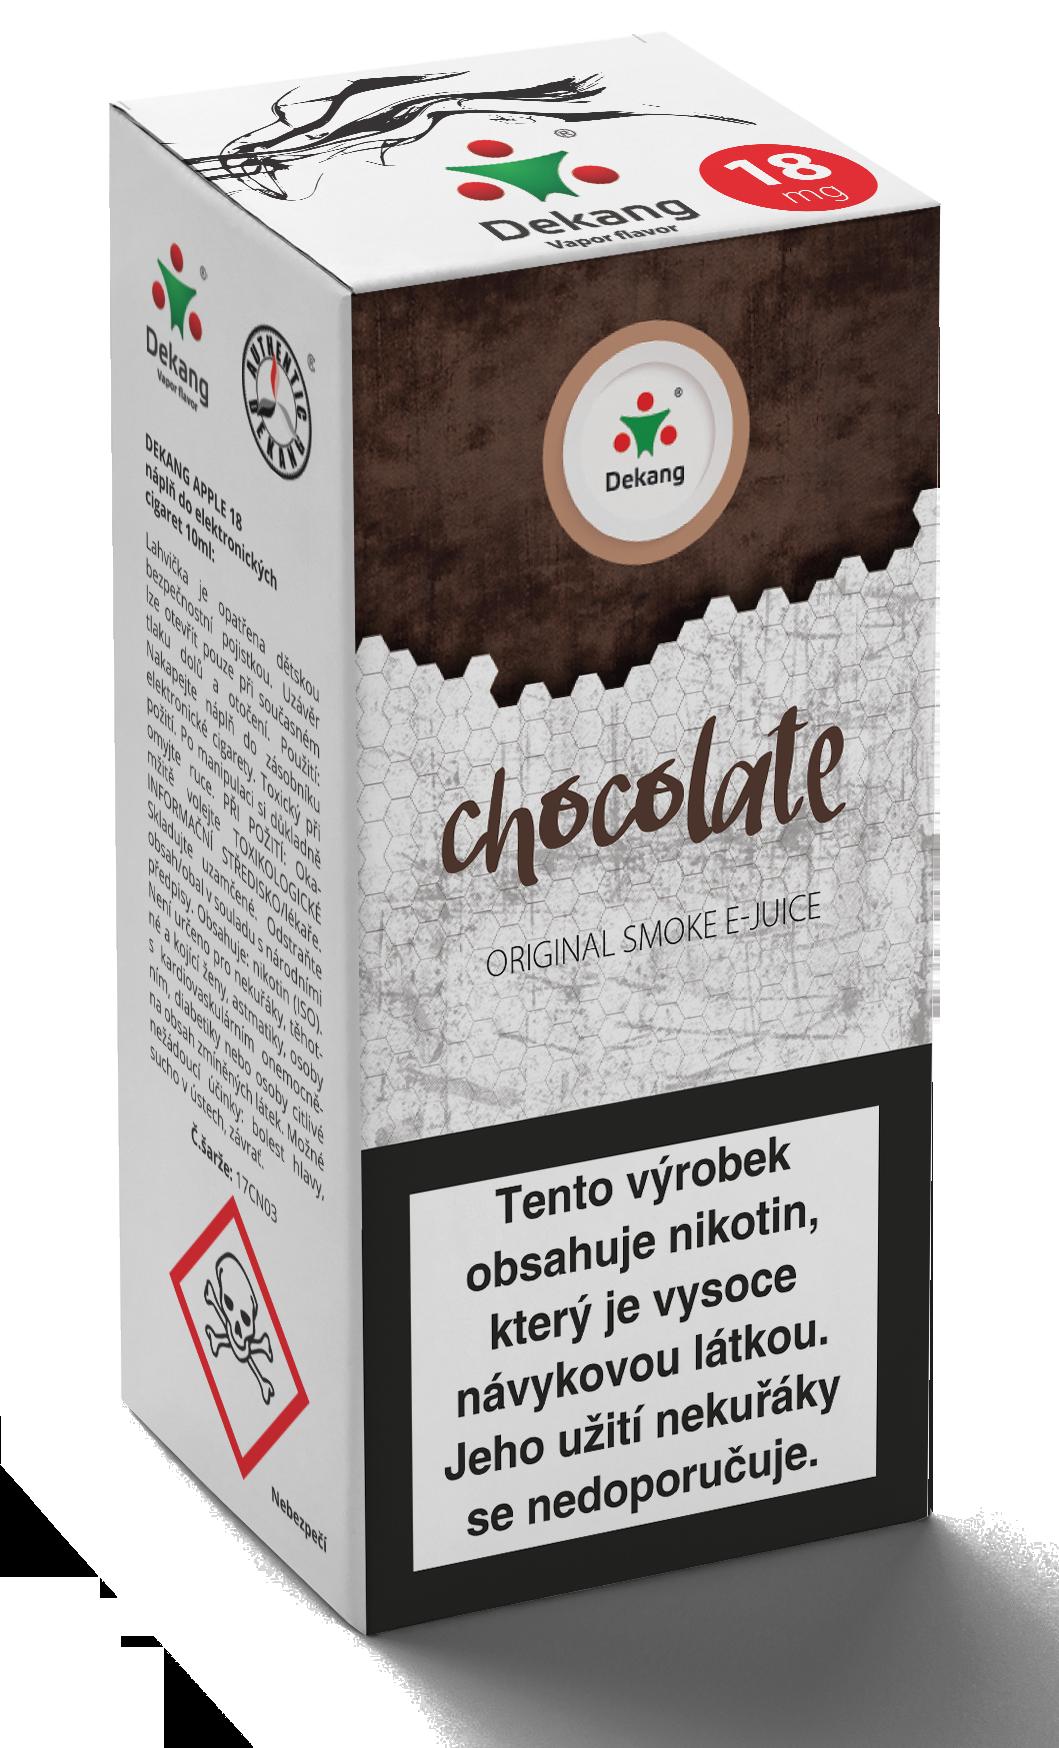 E-liquid Dekang 10ml Čokoláda - Chocolate Množství nikotinu: 0mg